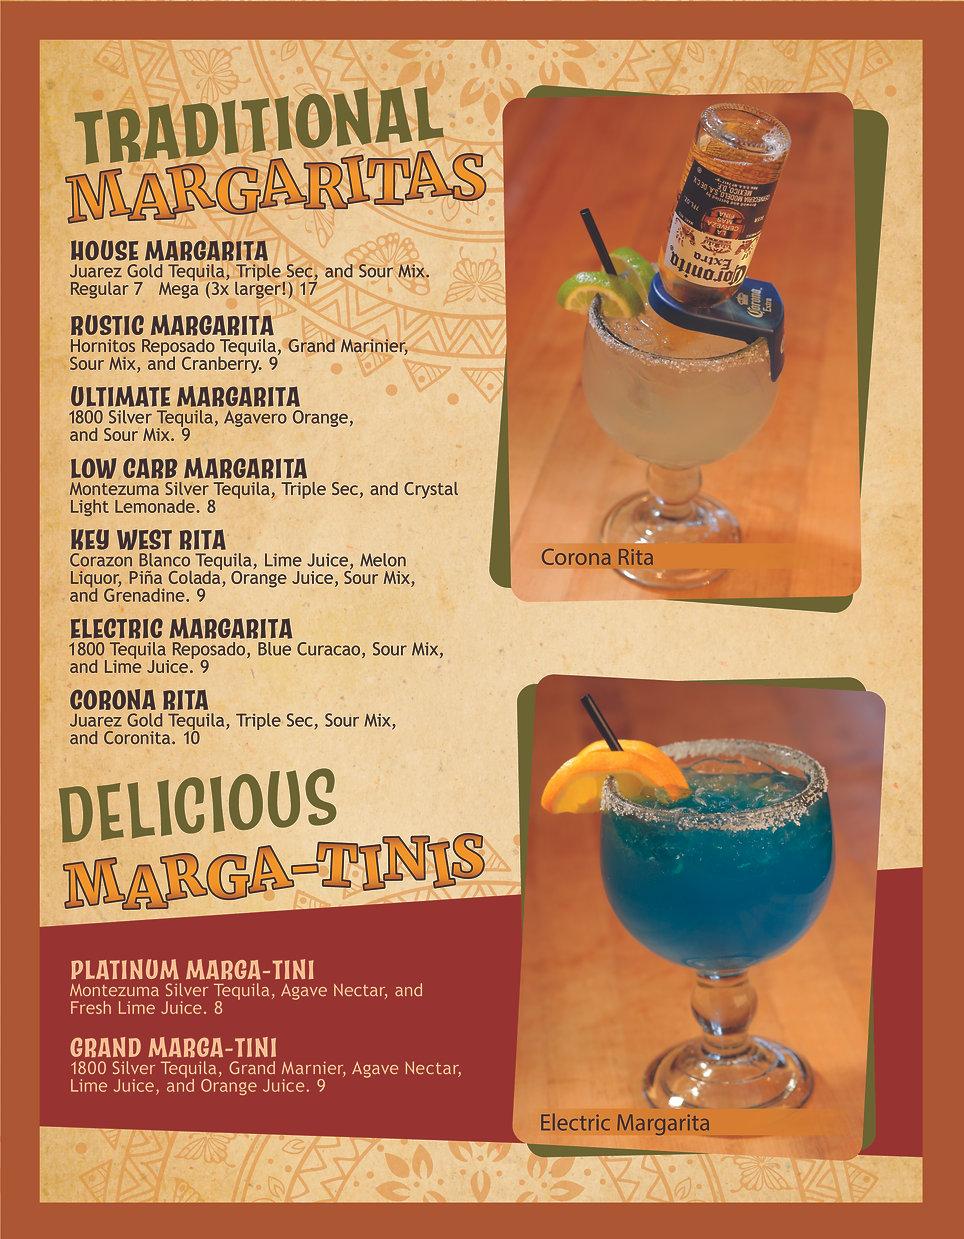 La Mariposa Drink Menu 9 12 19_Page_2.jp